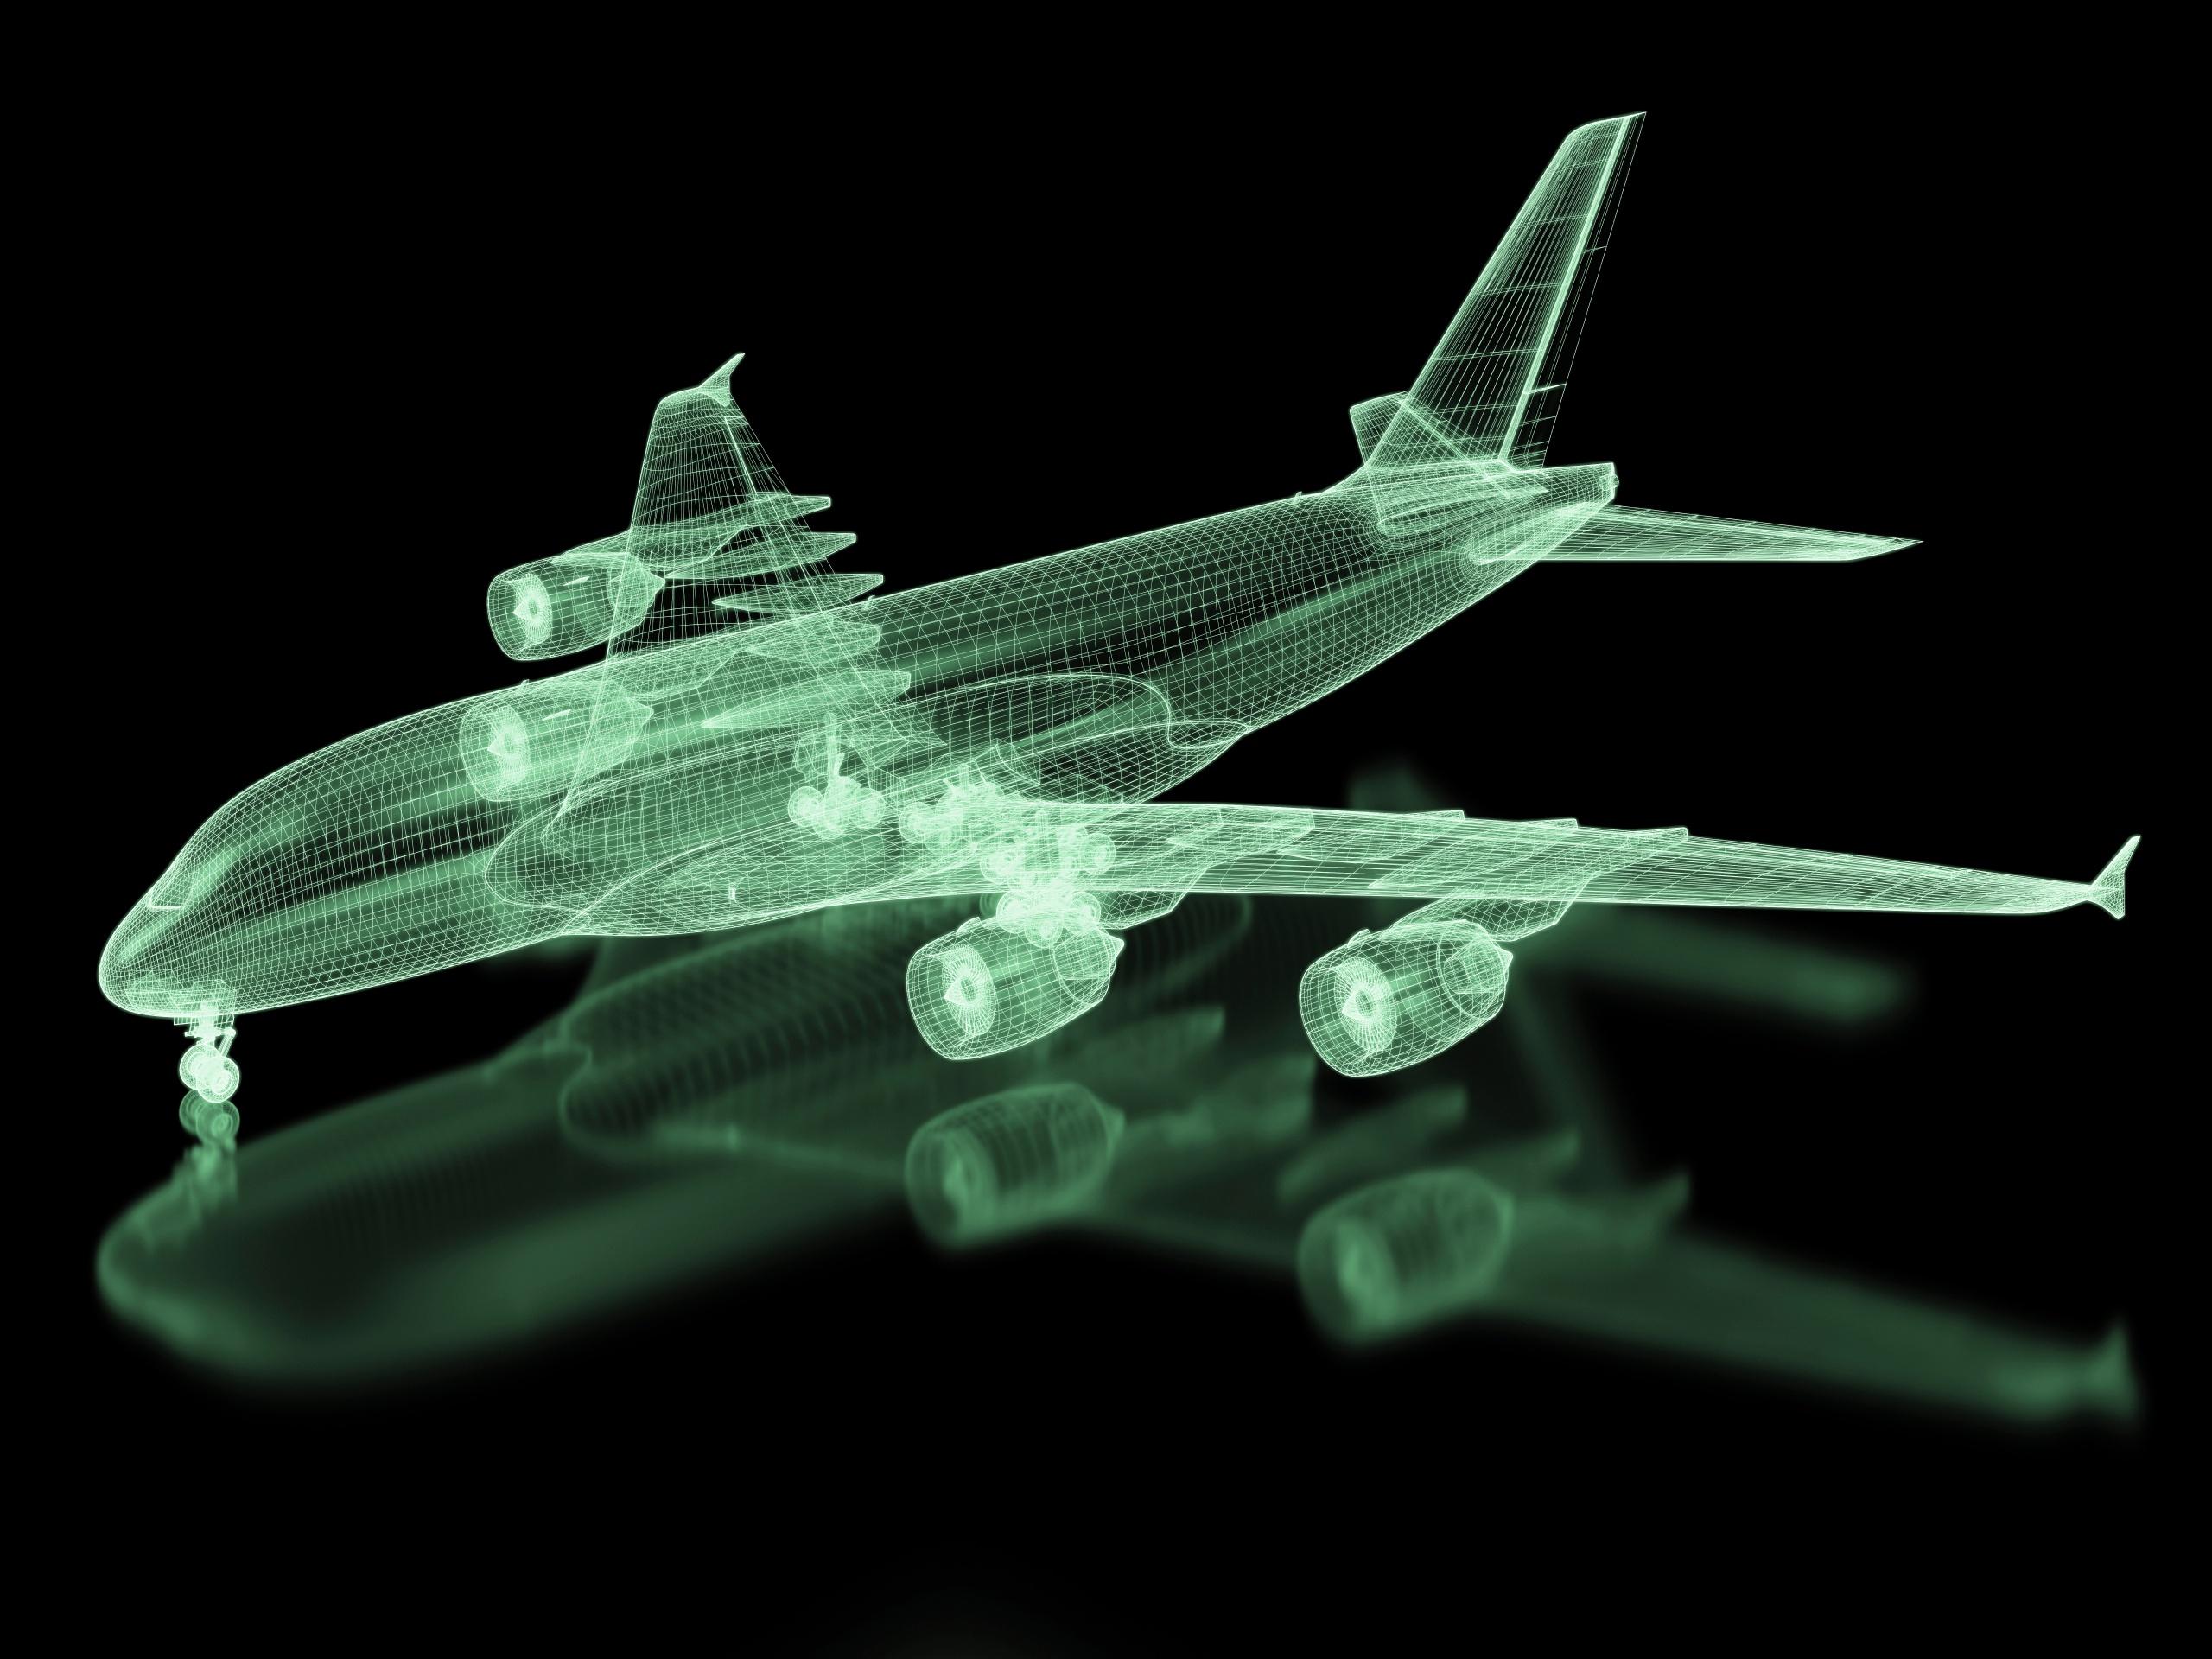 Aerospace_1.jpg